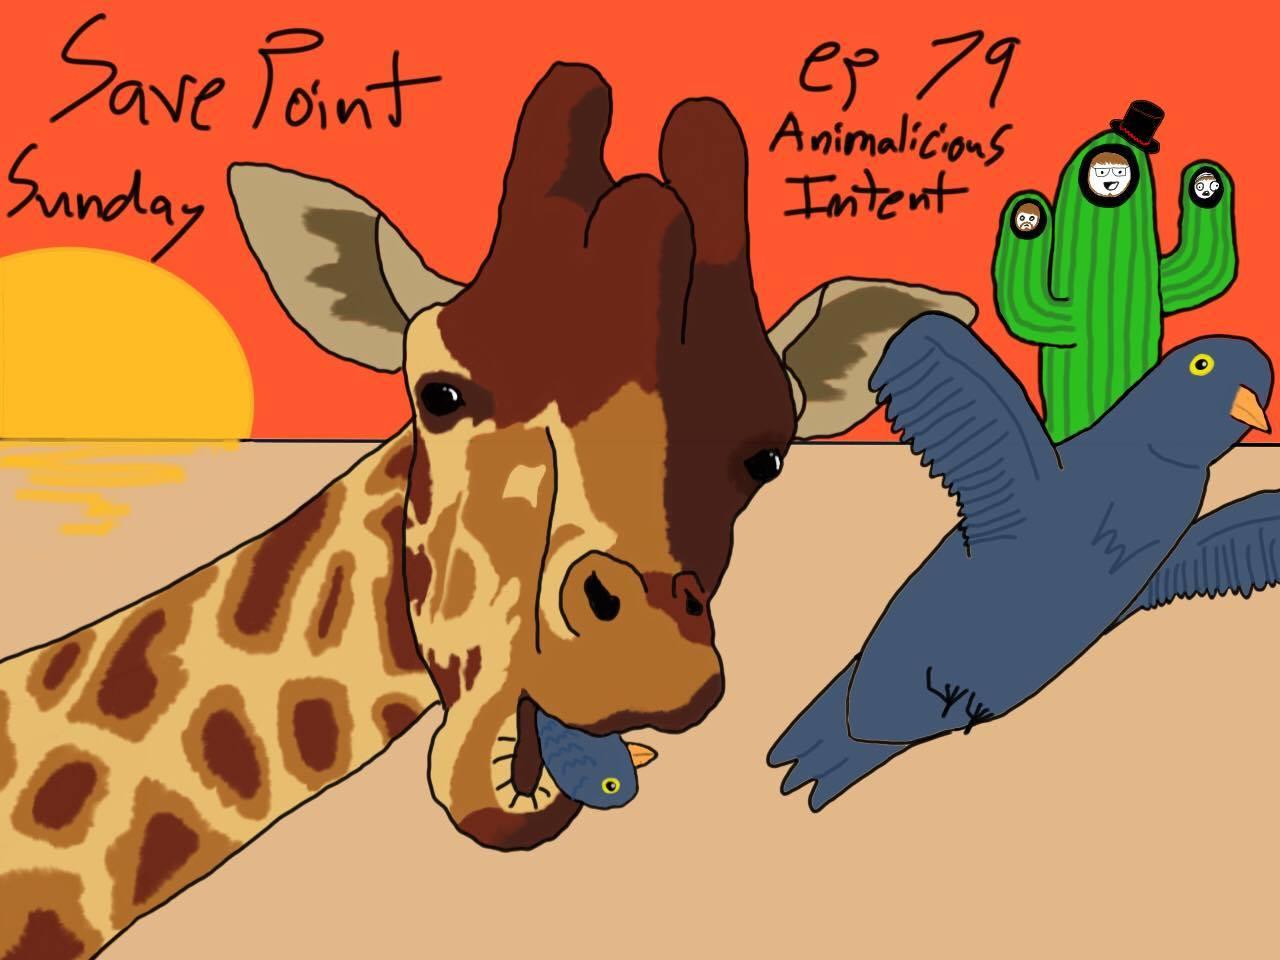 Episode 79: Animalicious Intent